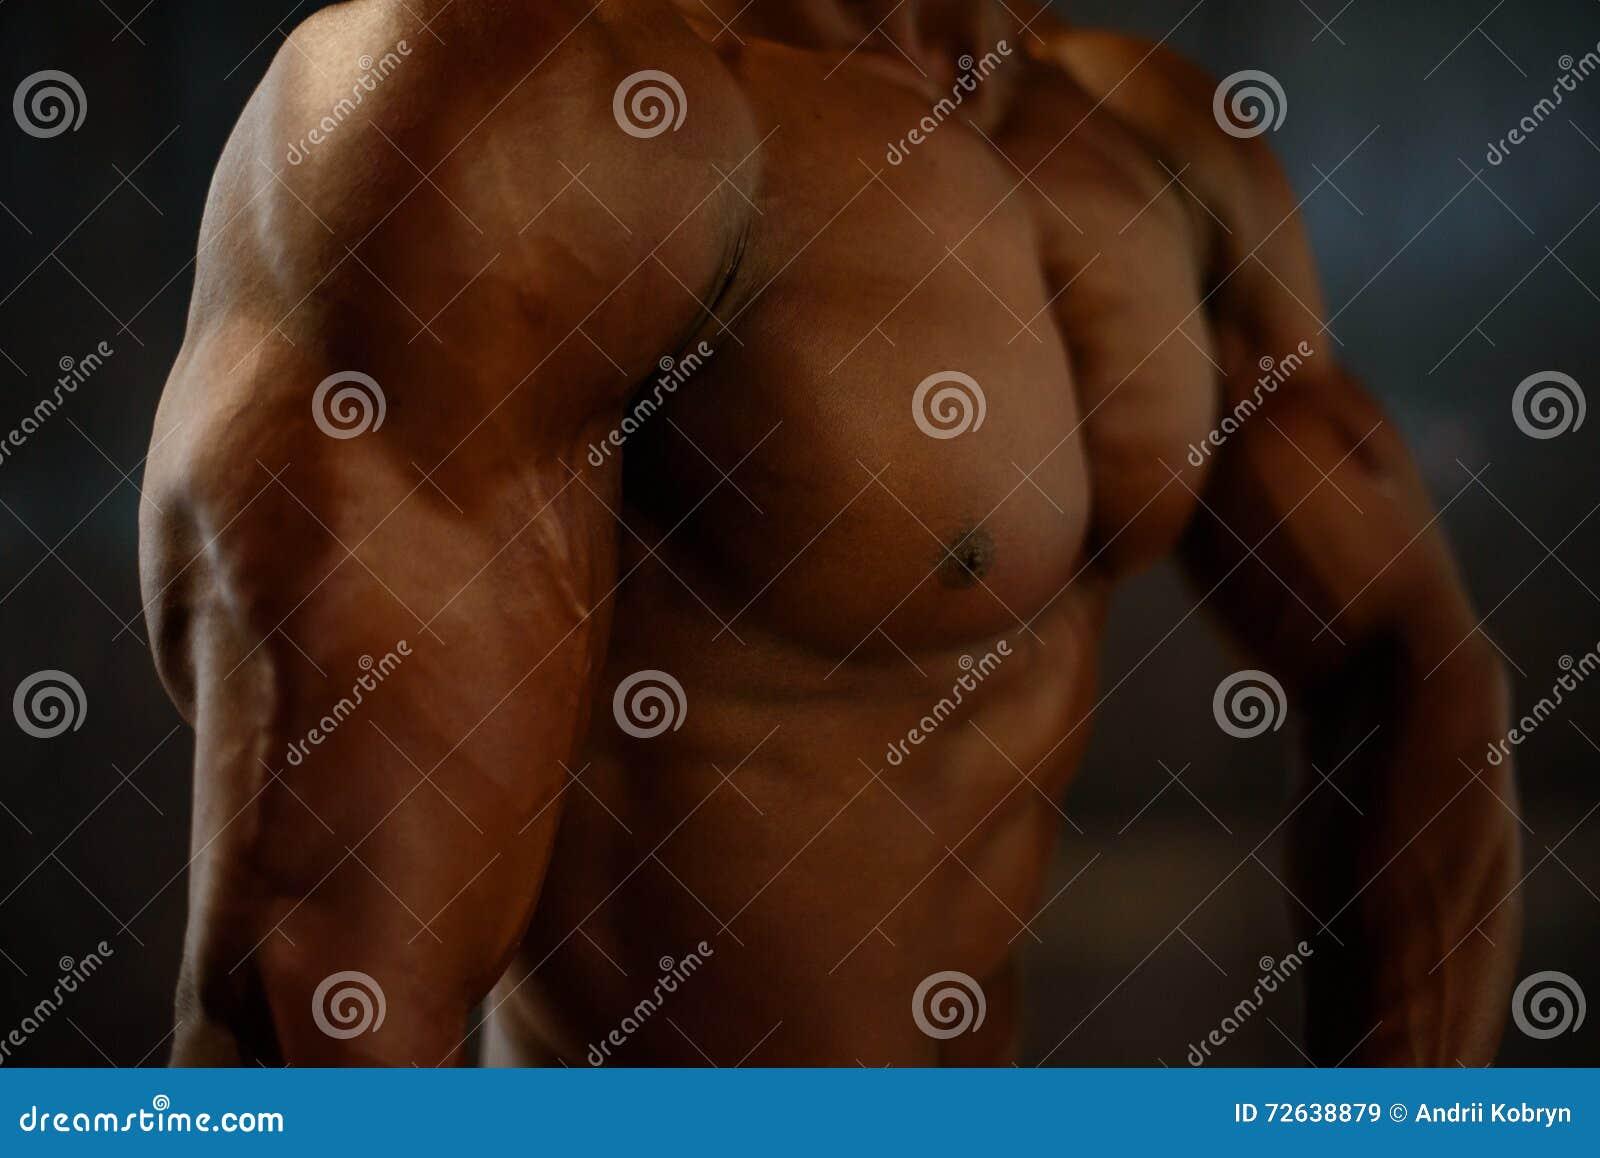 Sexy black men model pictures